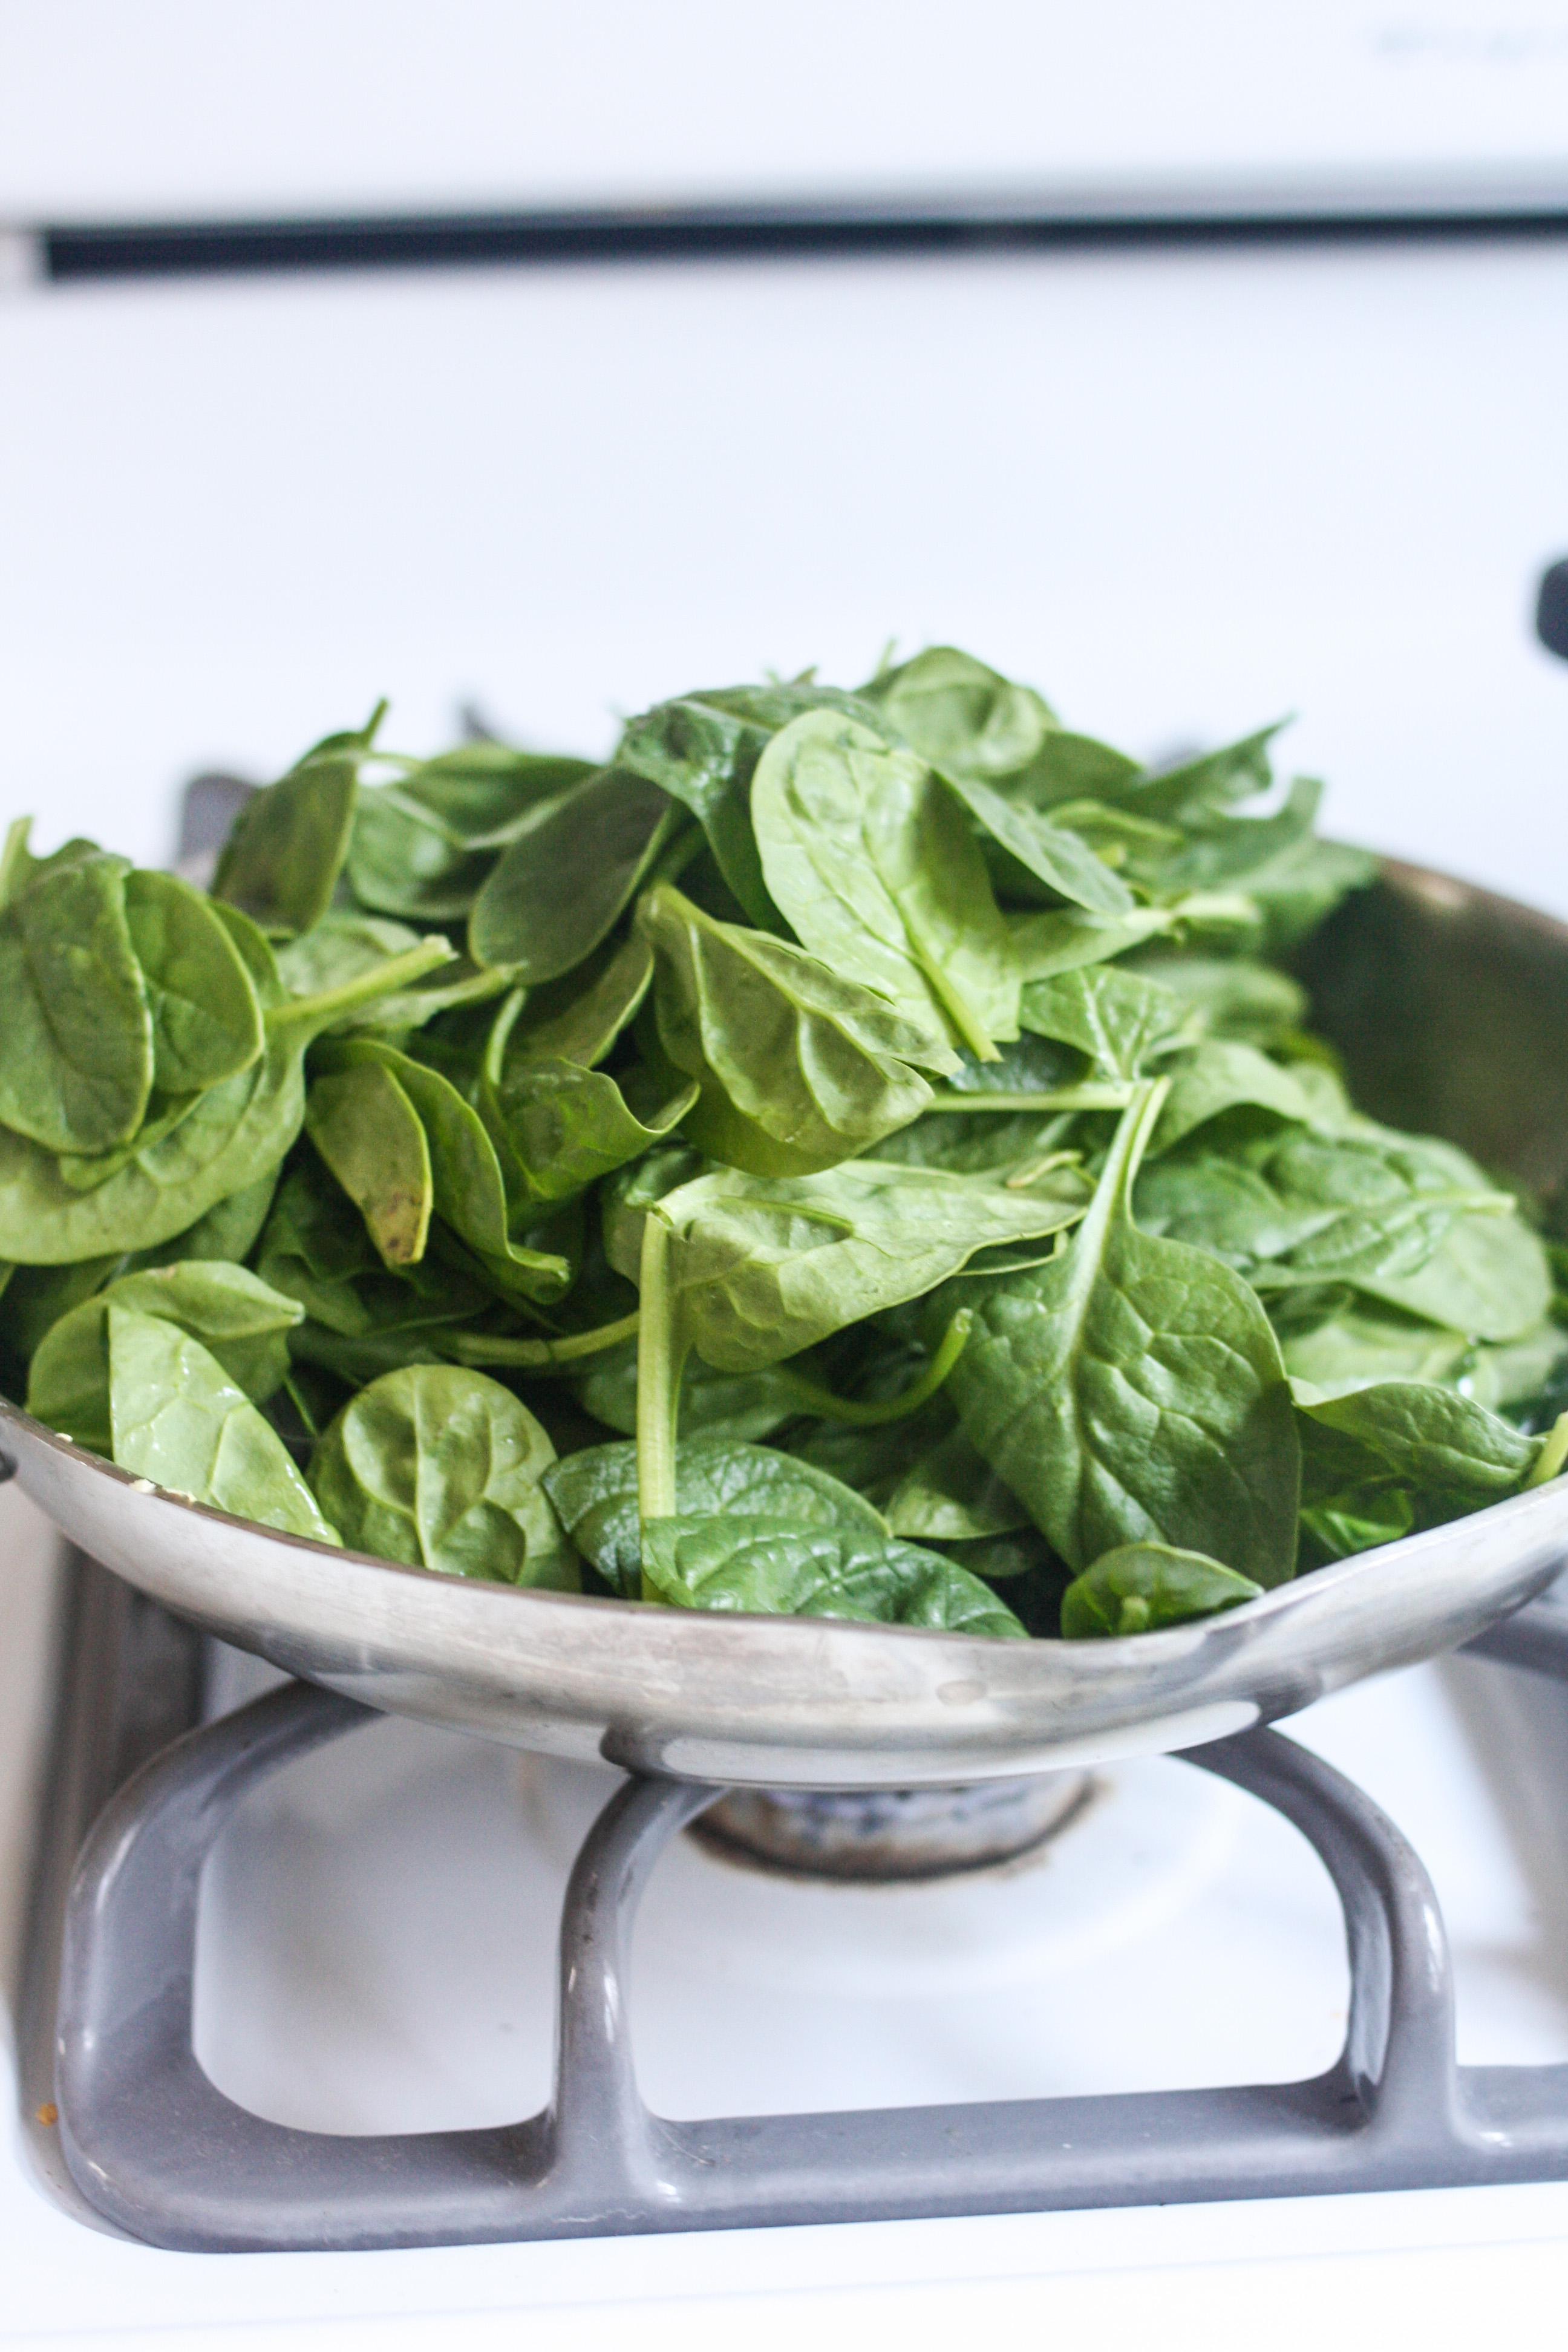 Catalan-Style Spinach - Orchard Street Kitchen